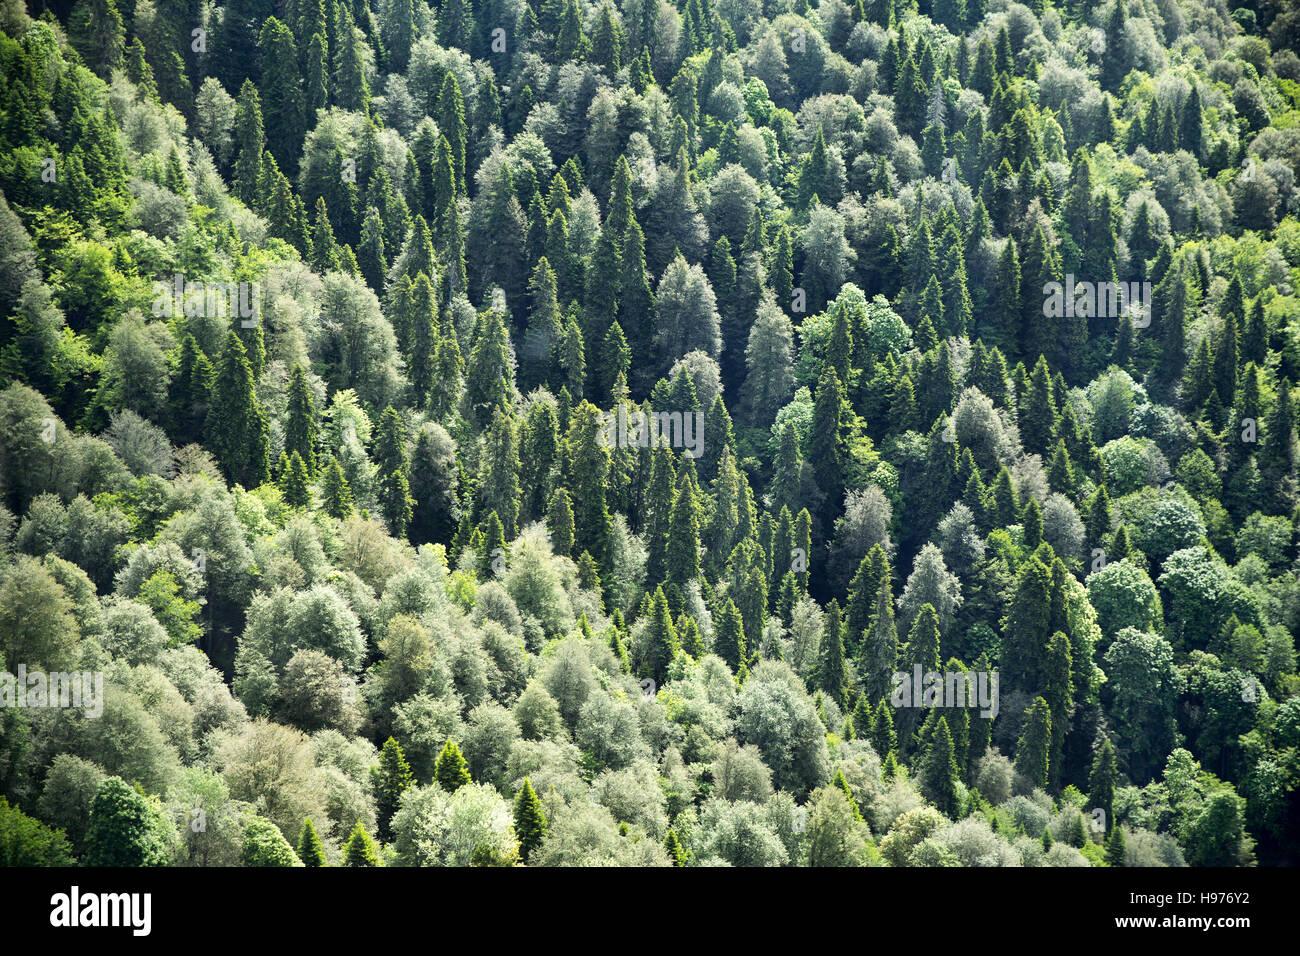 Forest. Krasnaya Polyana. Sochi. Russia - Stock Image